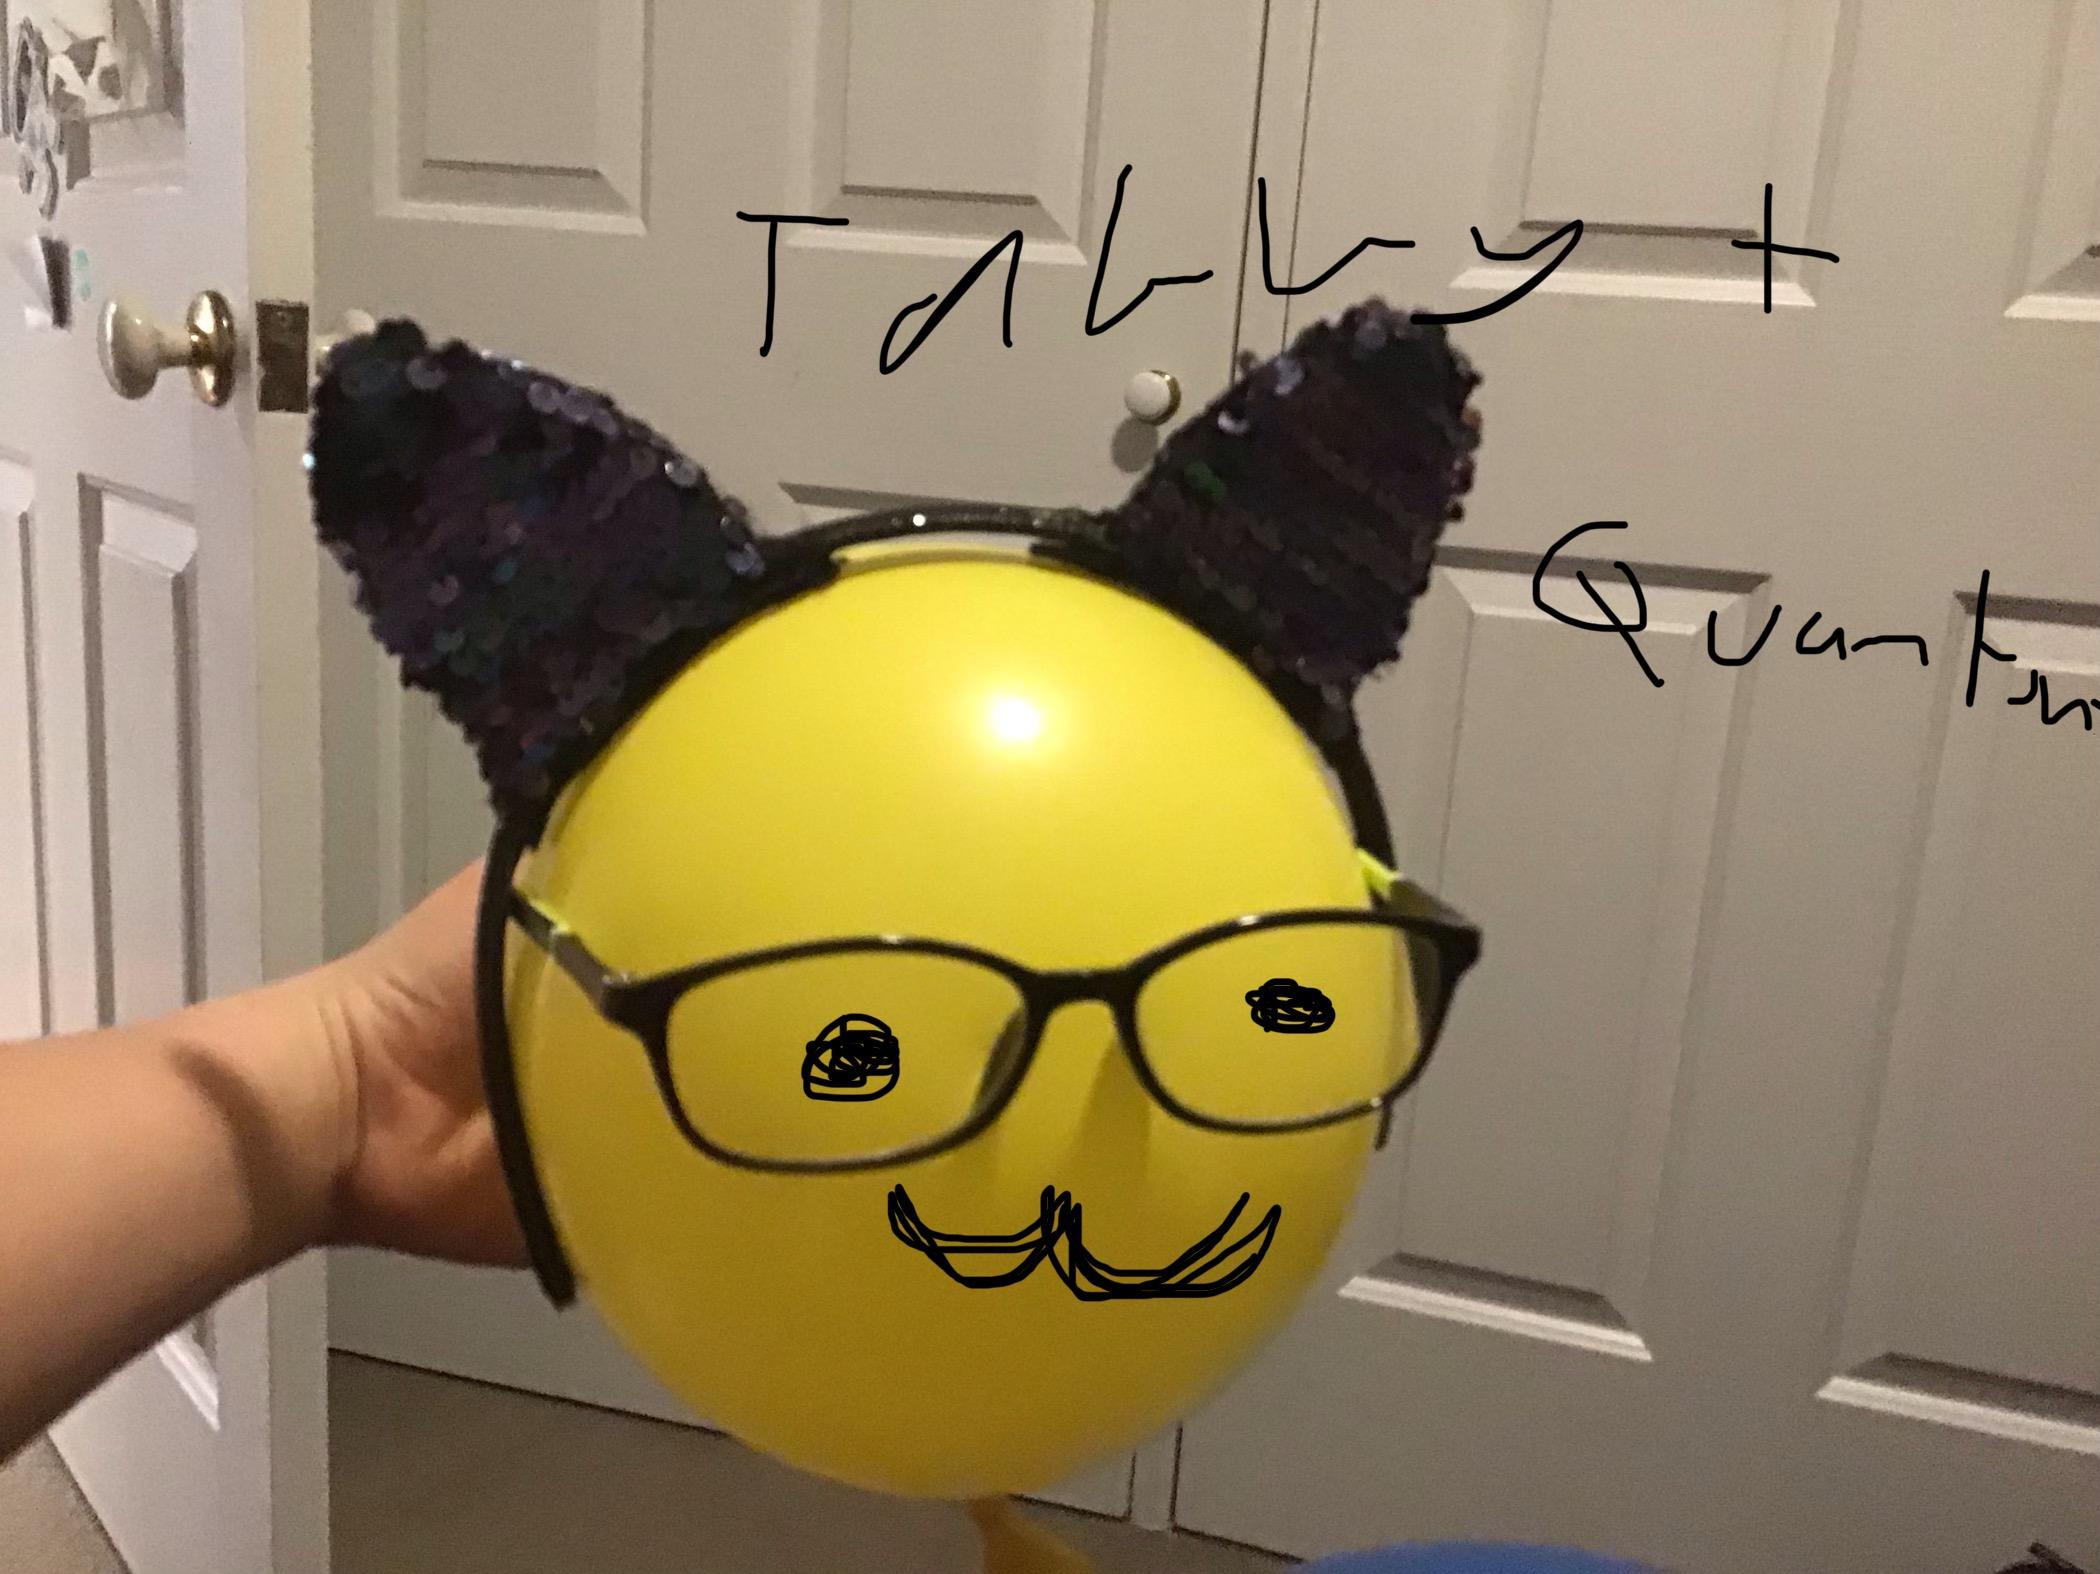 Tabby quantum slime with fashion pod